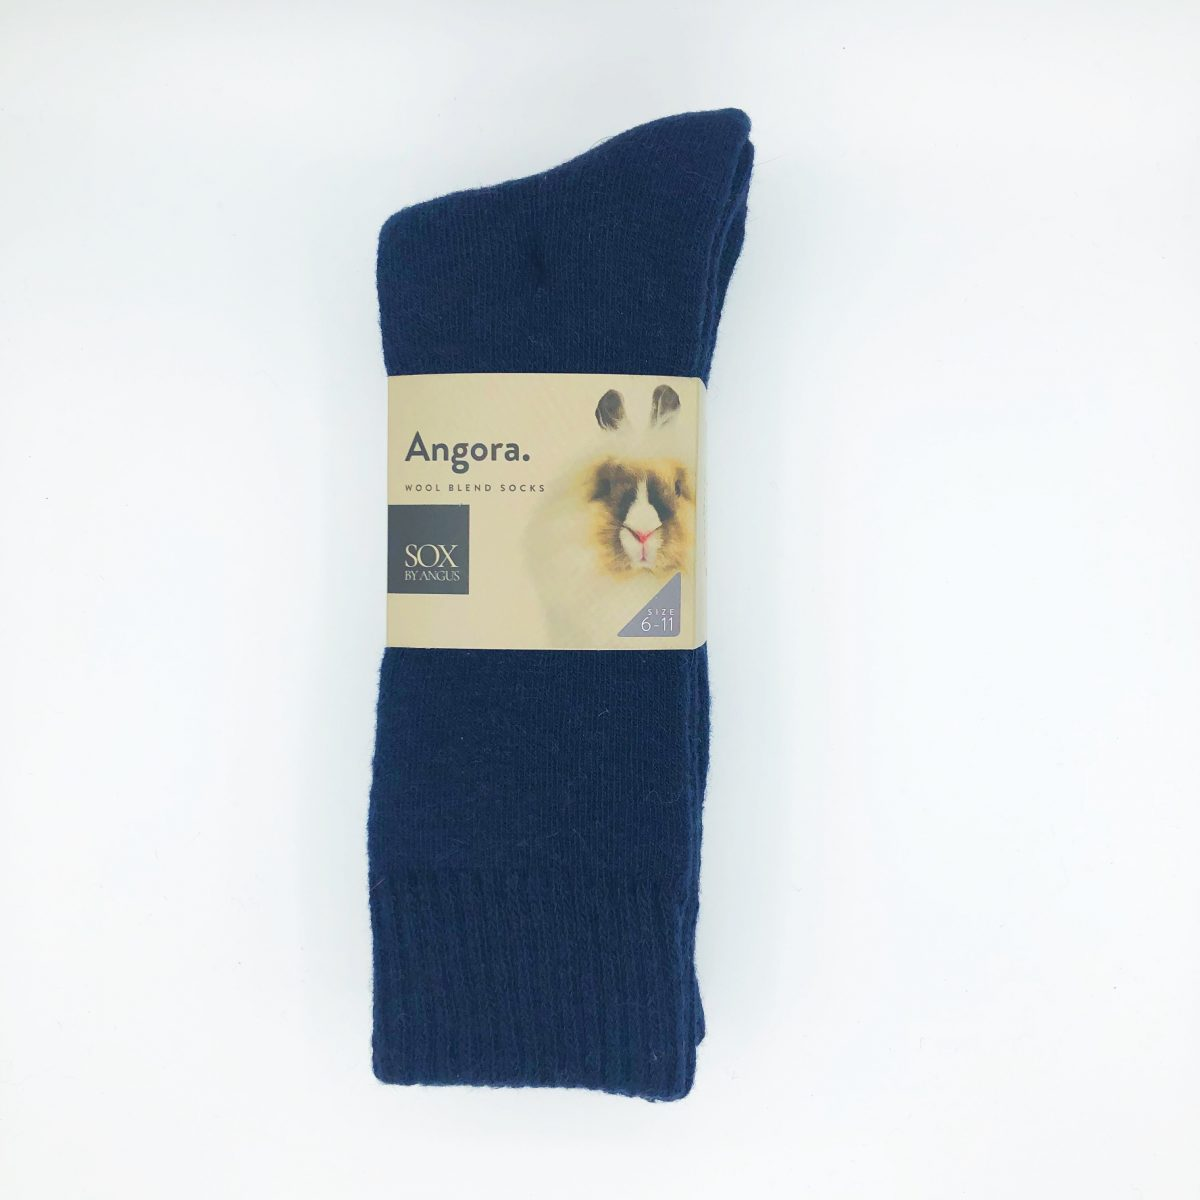 Angora Wool Blend Socks 2 Pair Pack - Navy